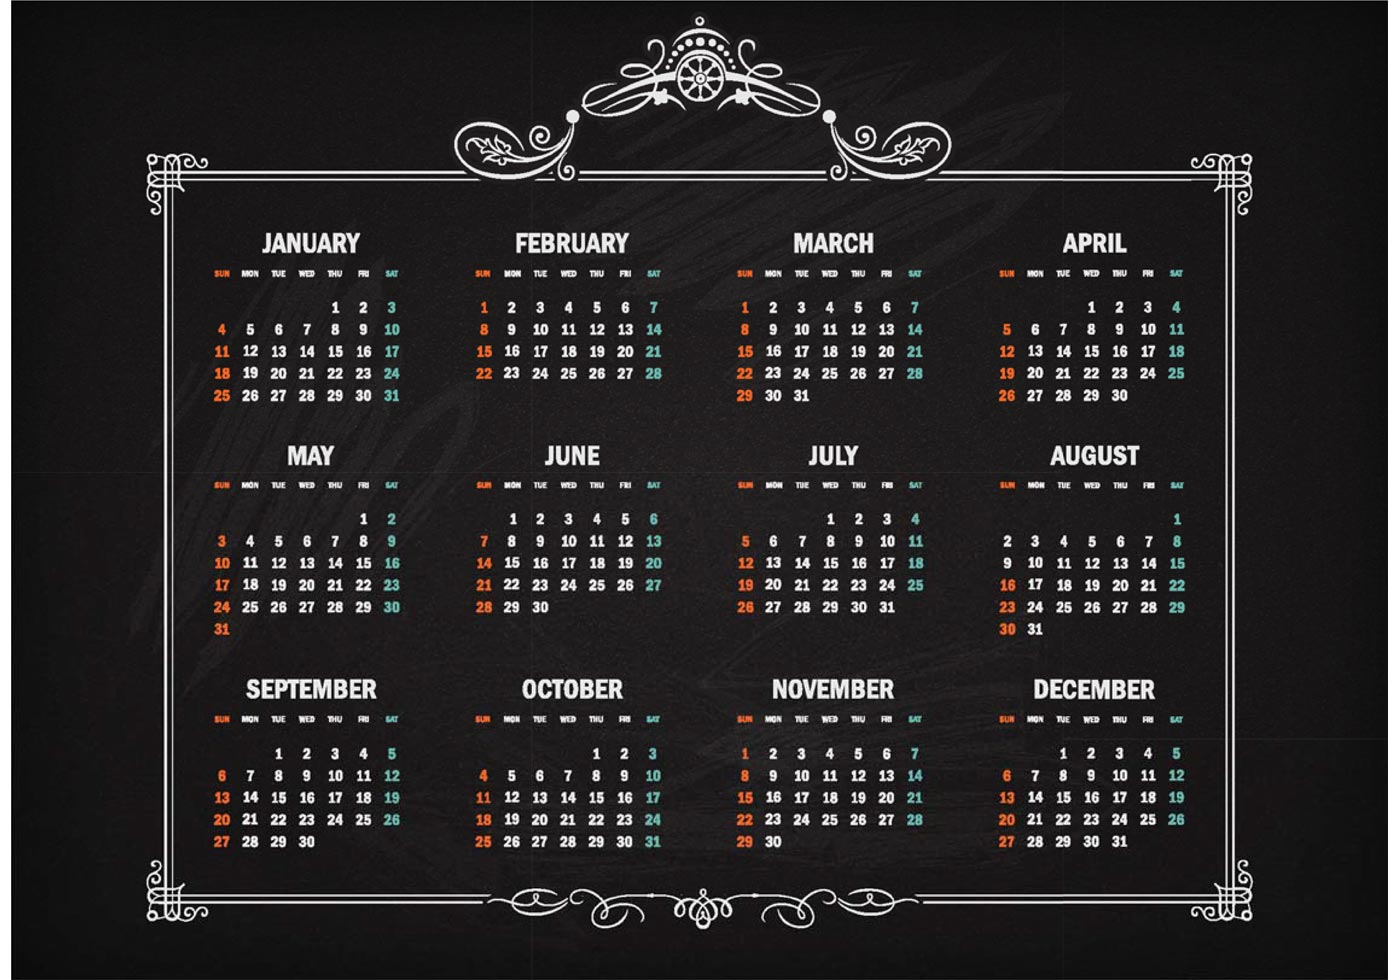 free vector retro calendar 2015 on blackboard